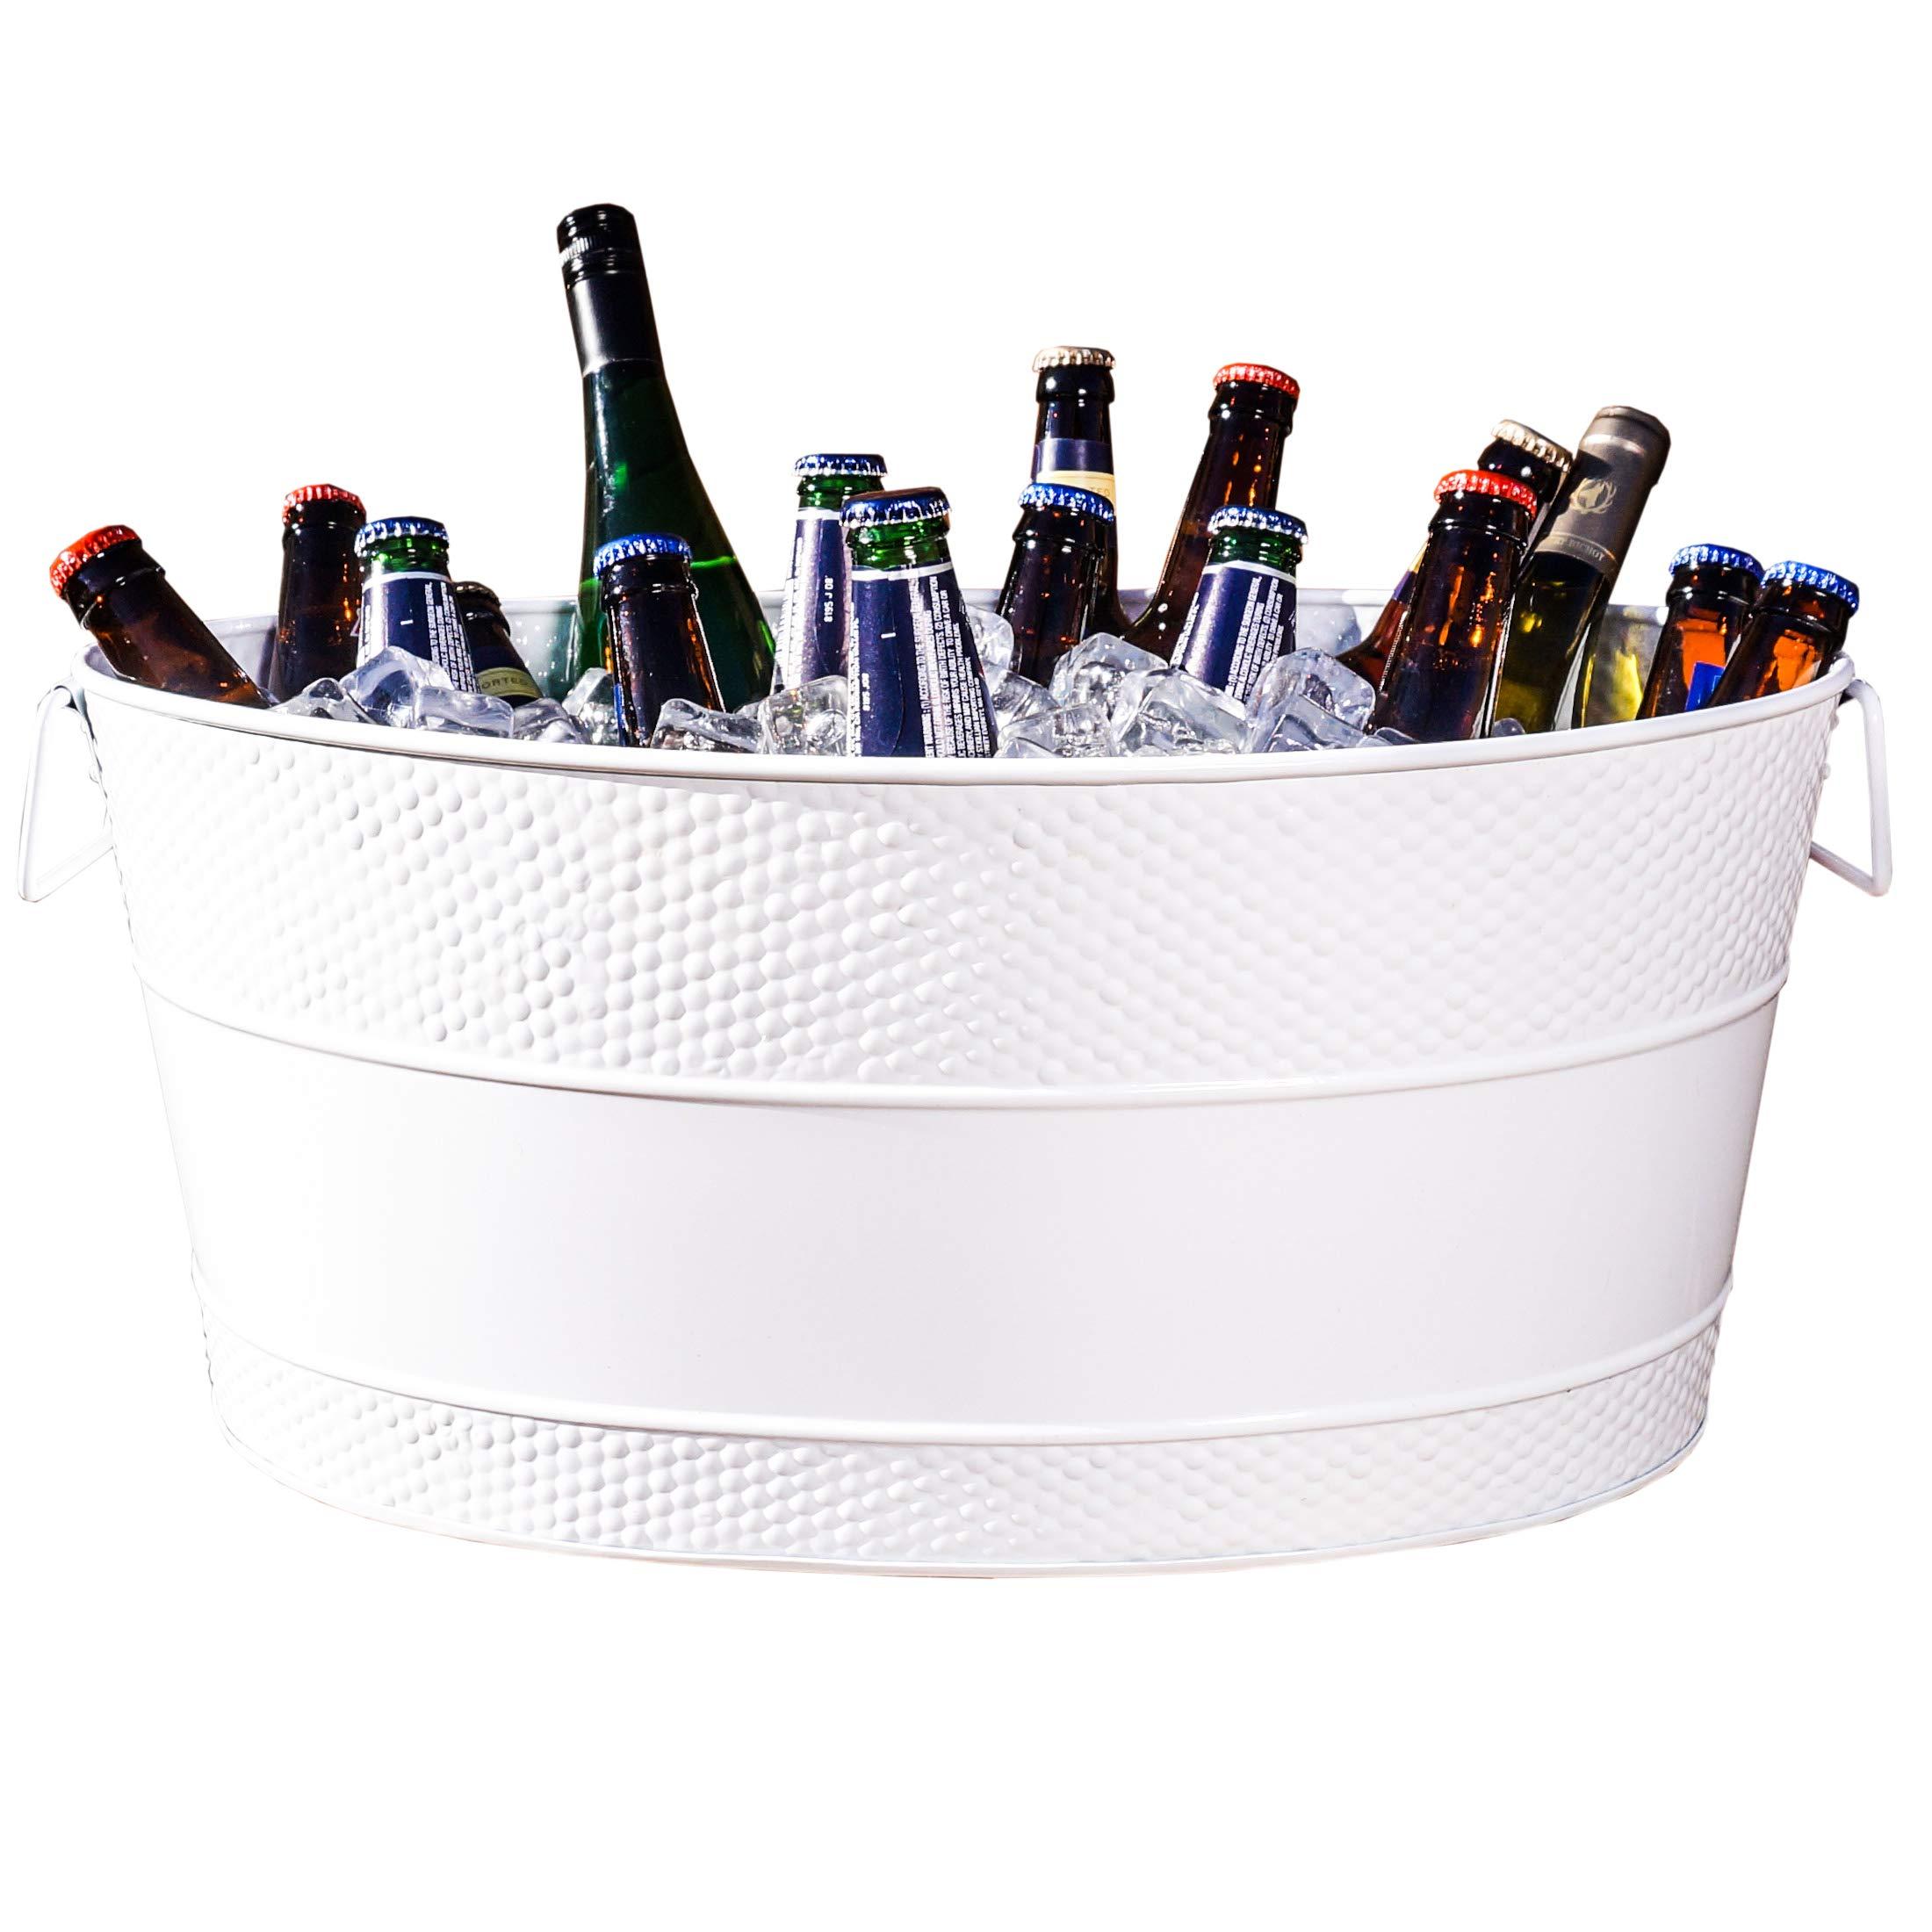 BREKX White Aspen Hammered Galvanized Beverage Tub for Weddings/Anniversary/Housewarming/ETC Gifts - 25 Quart